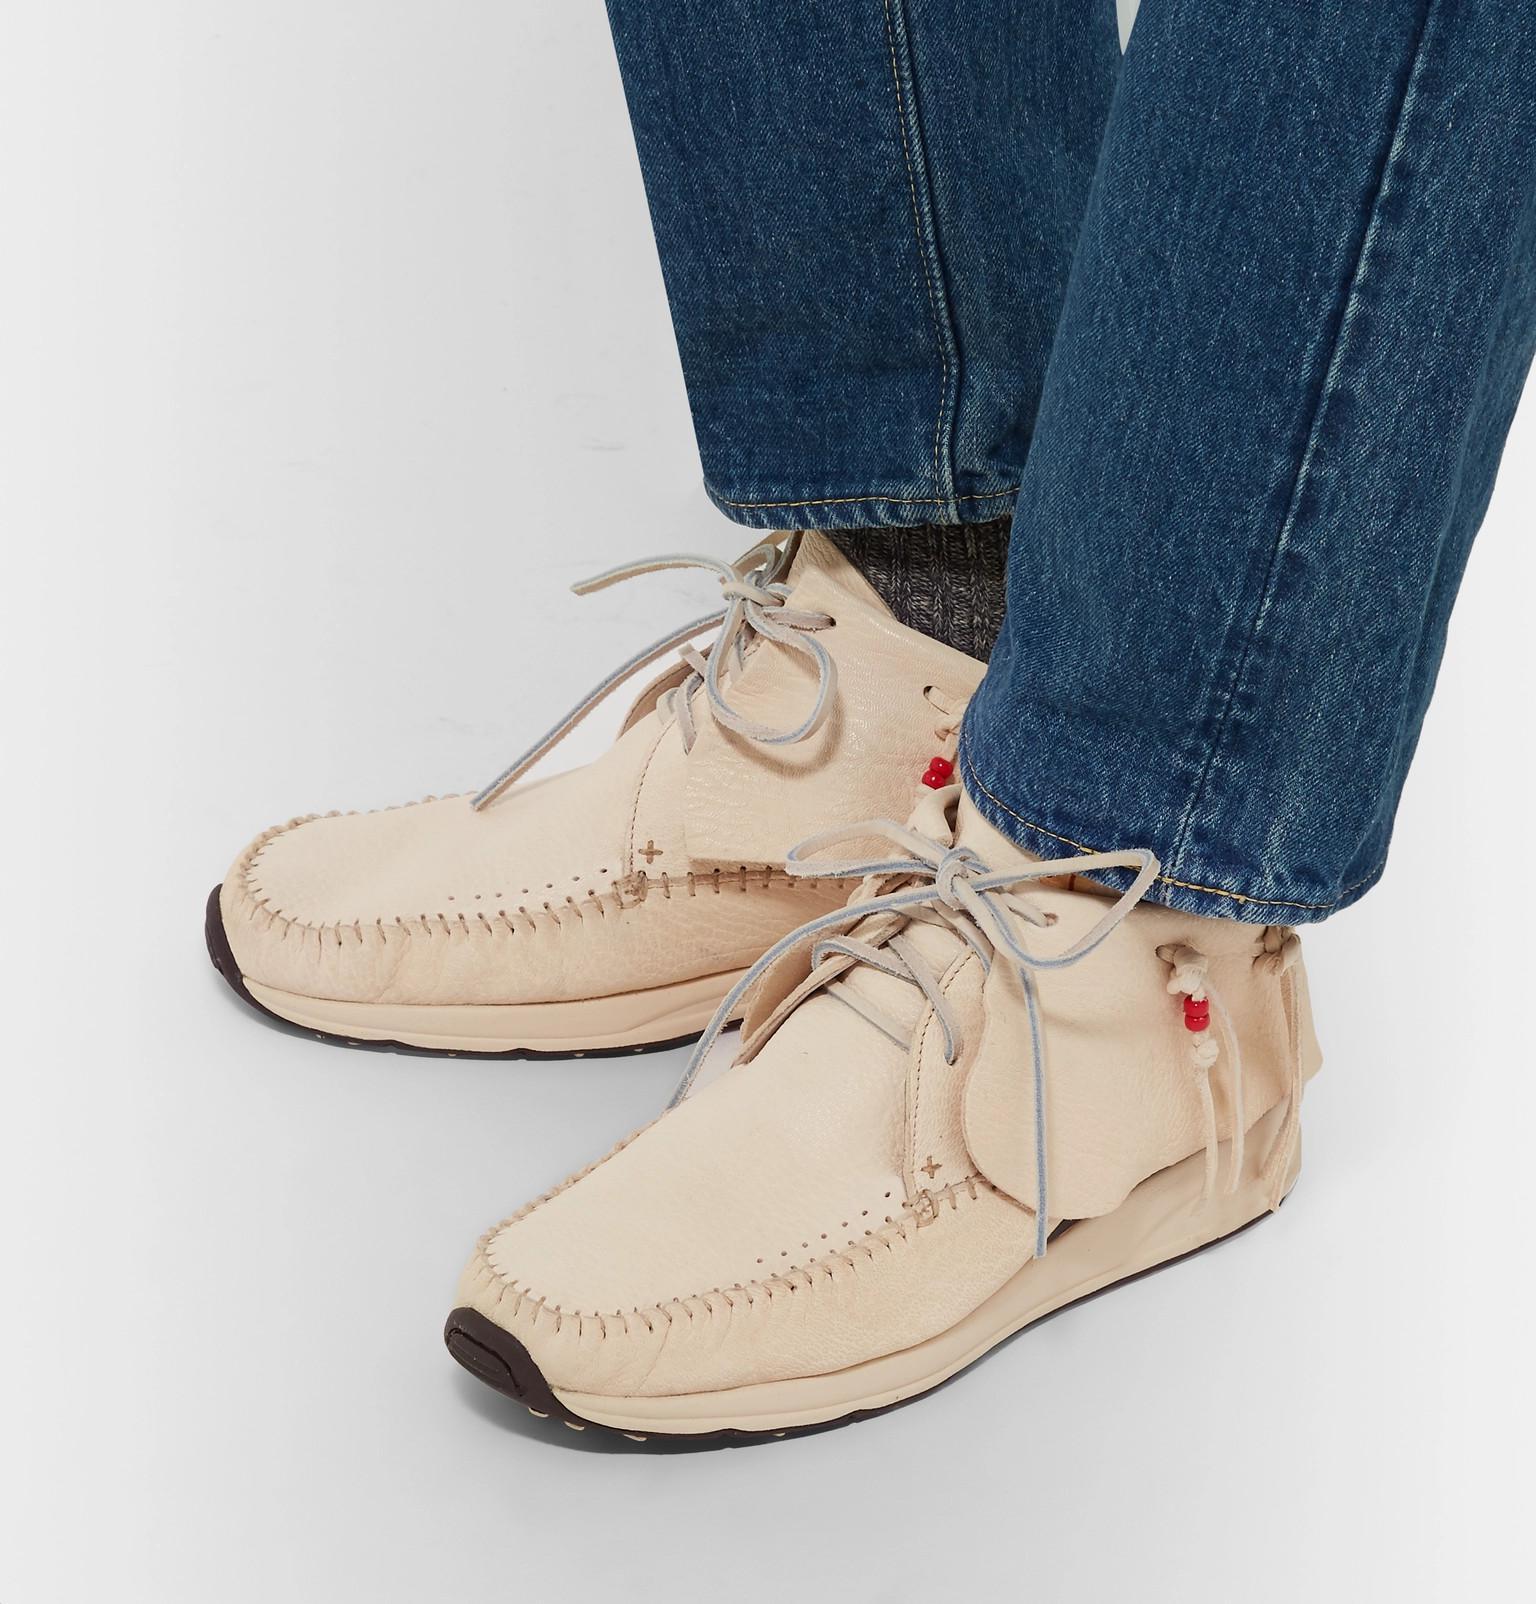 Grain Full Sneakers Leather Visvim Men Lyst Natural In Fbt For twUq7WWPZc